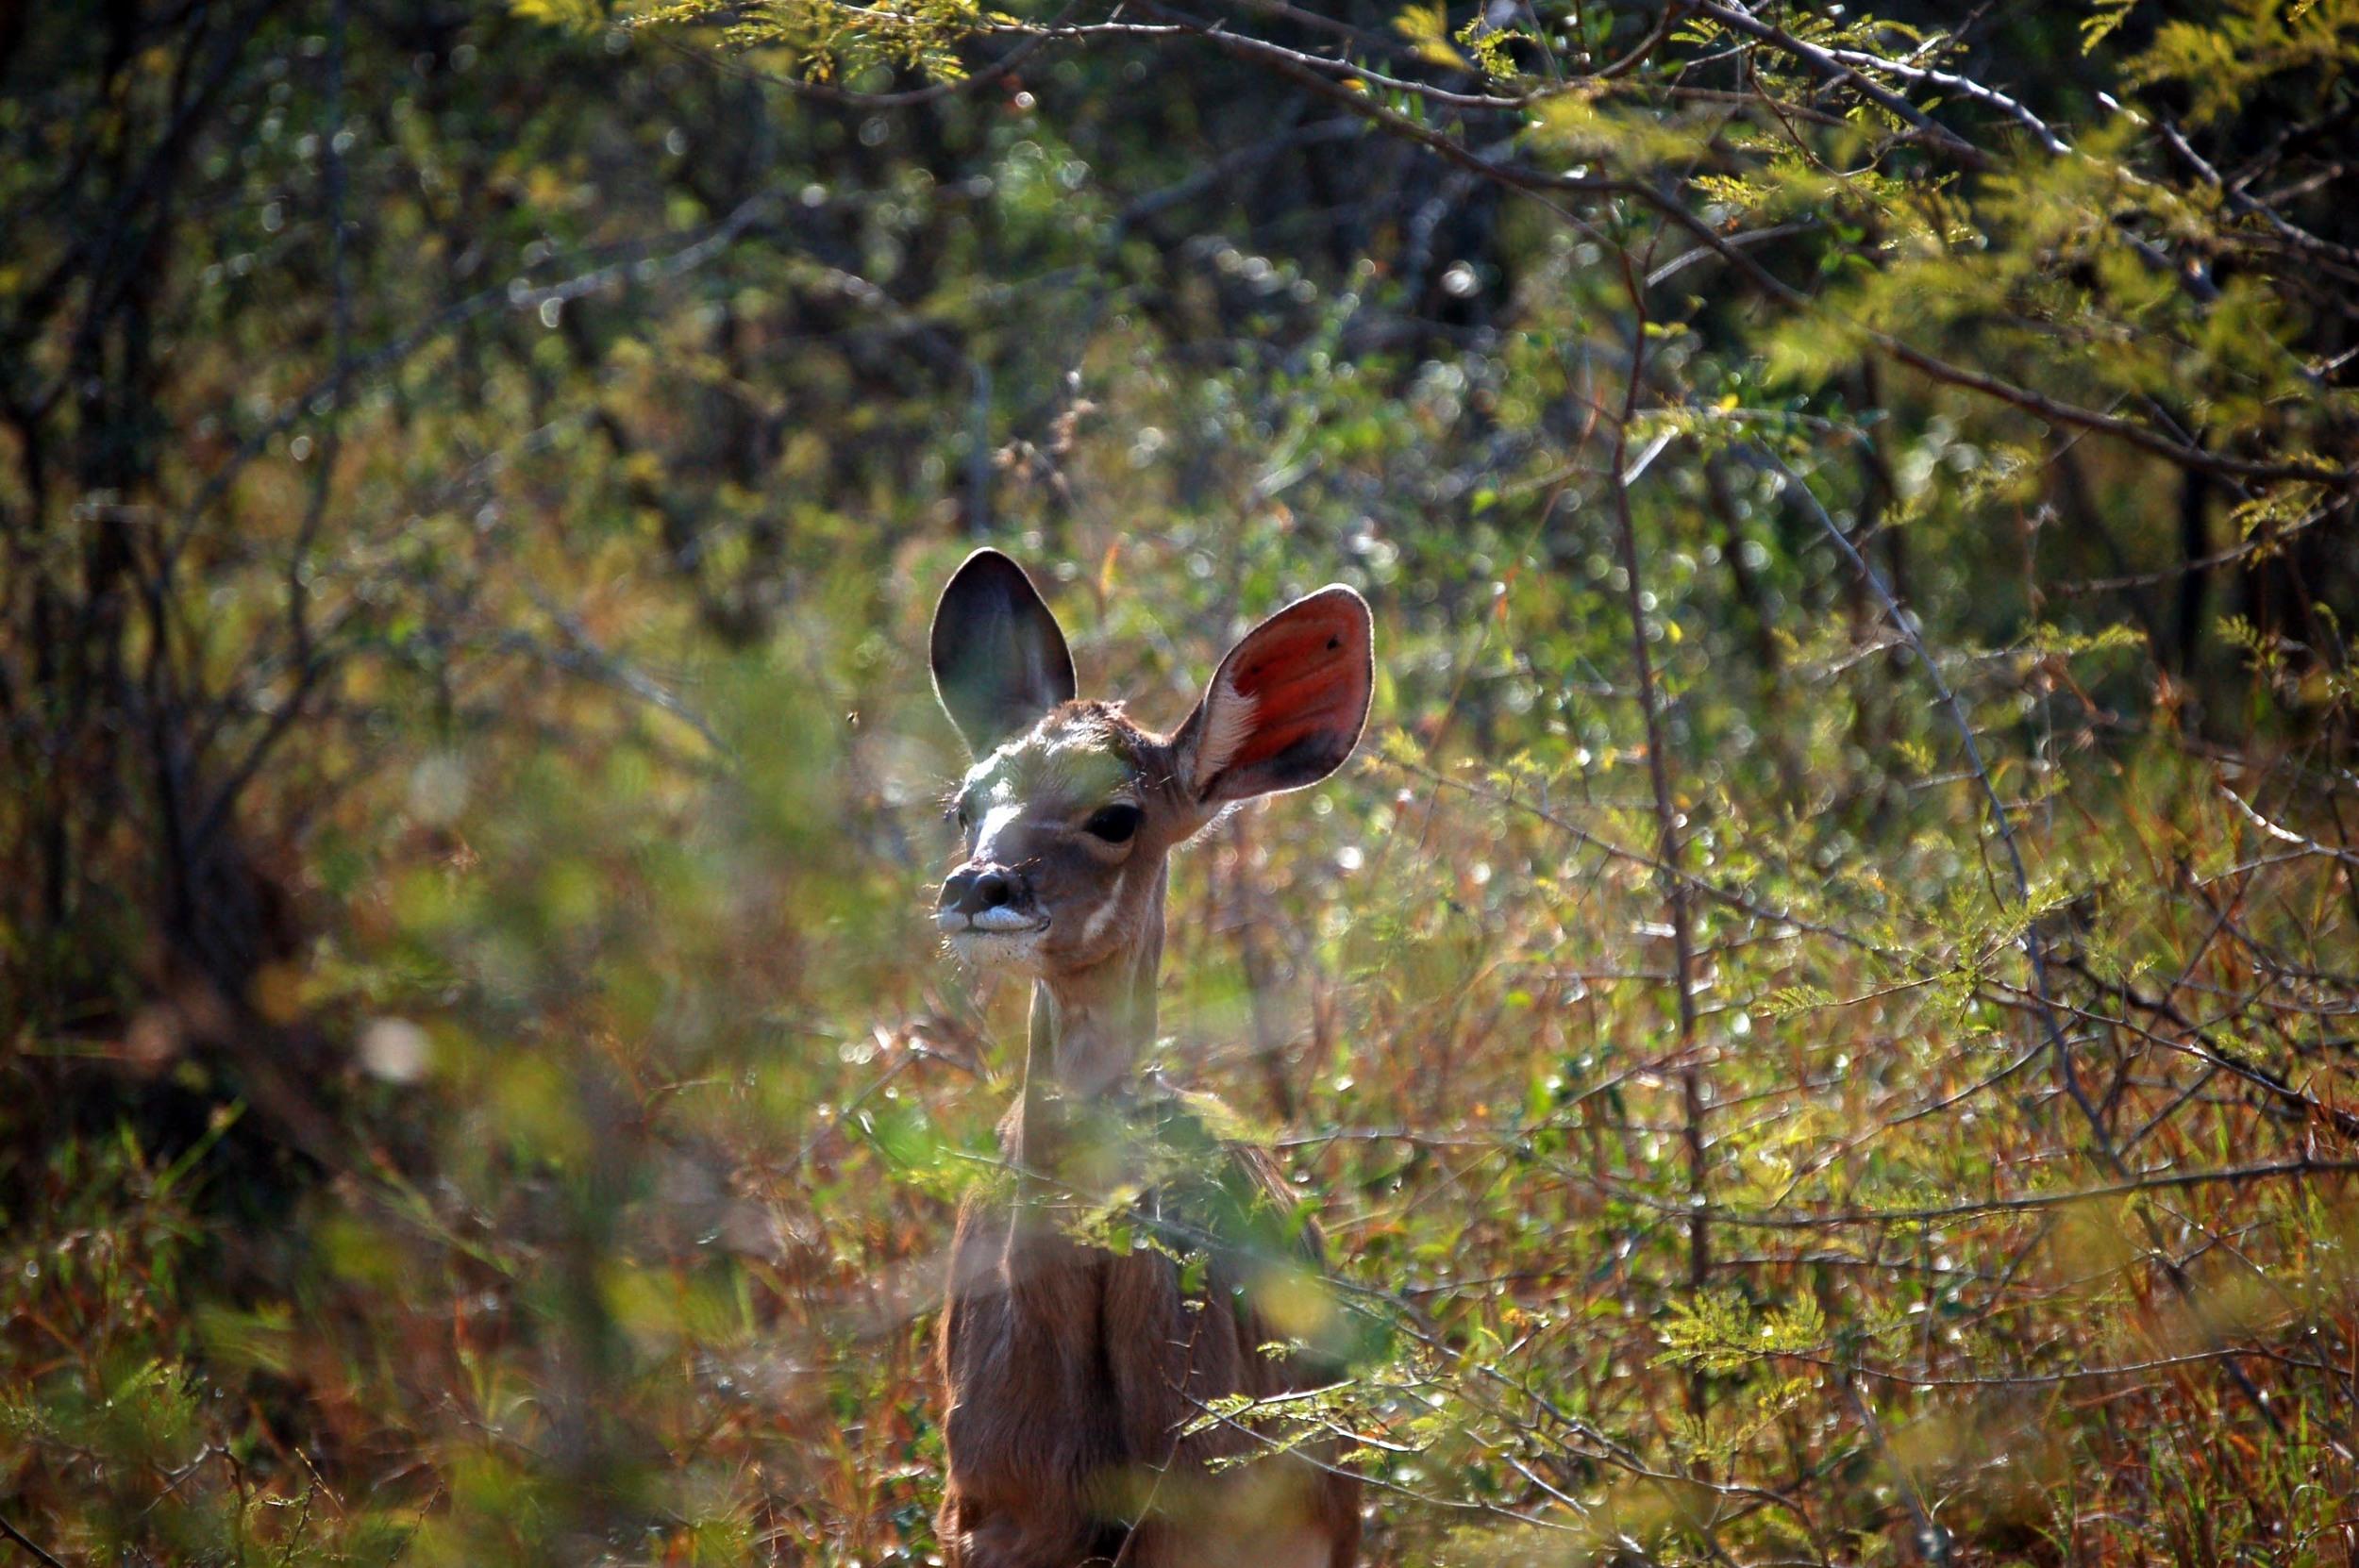 Immature Kudu